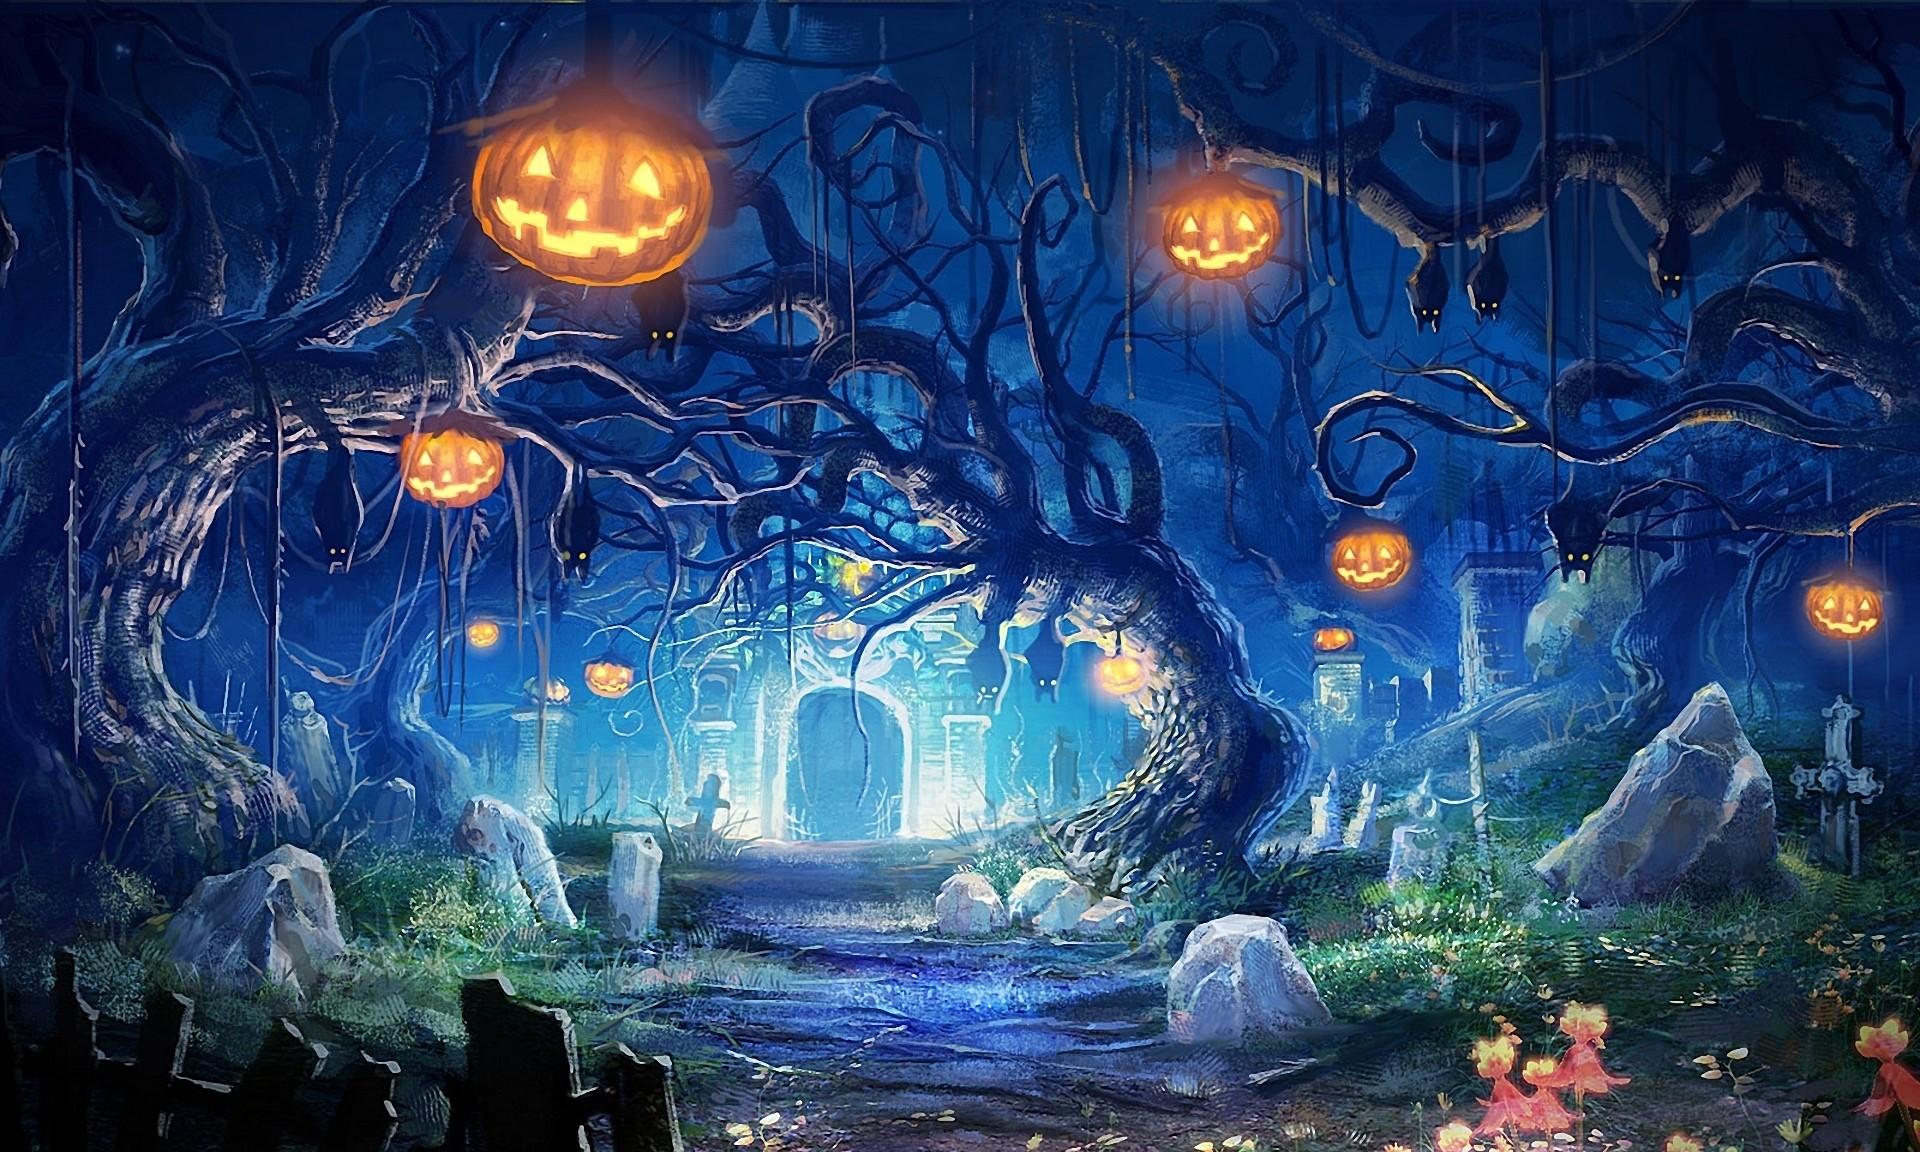 download Live Halloween Wallpaper for Desktop 62 images 1920x1152